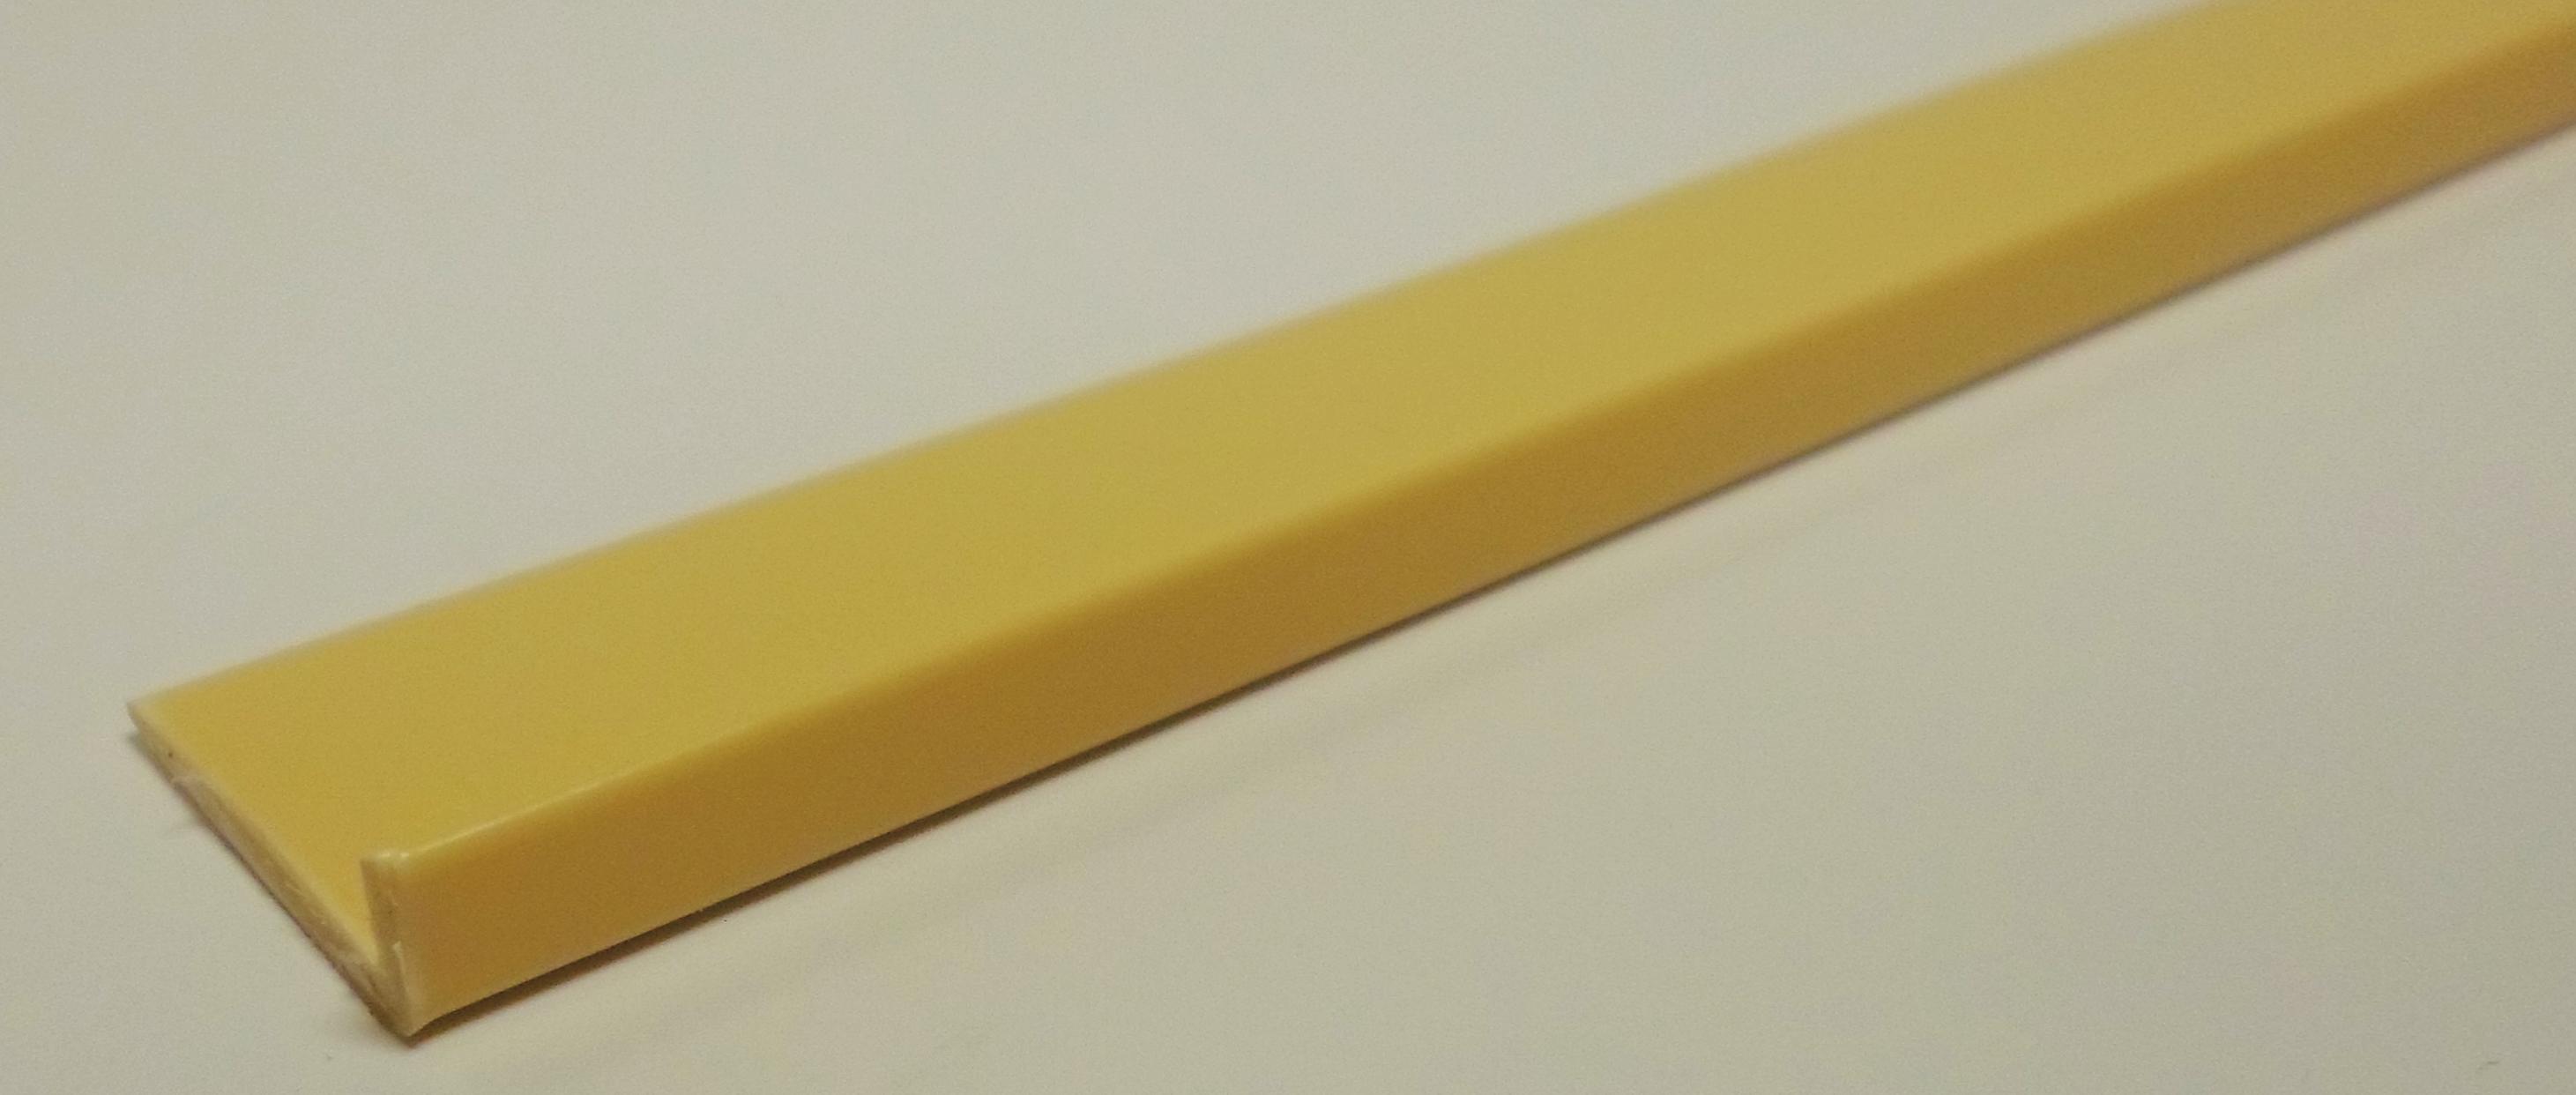 Cream Lipped Edge